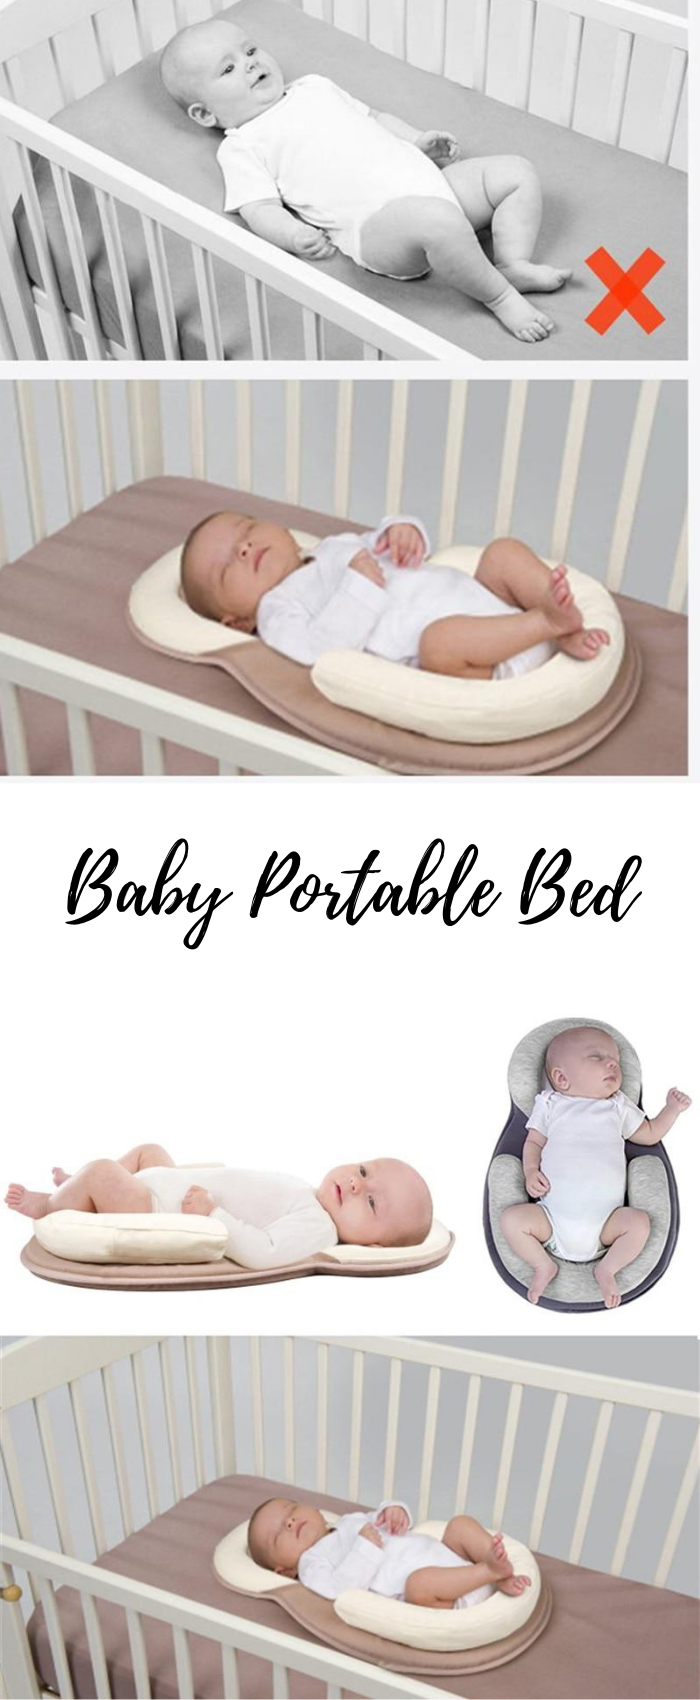 Anti Flat Head Baby Mattress Flat Head Baby Baby Mattress Baby Pillows